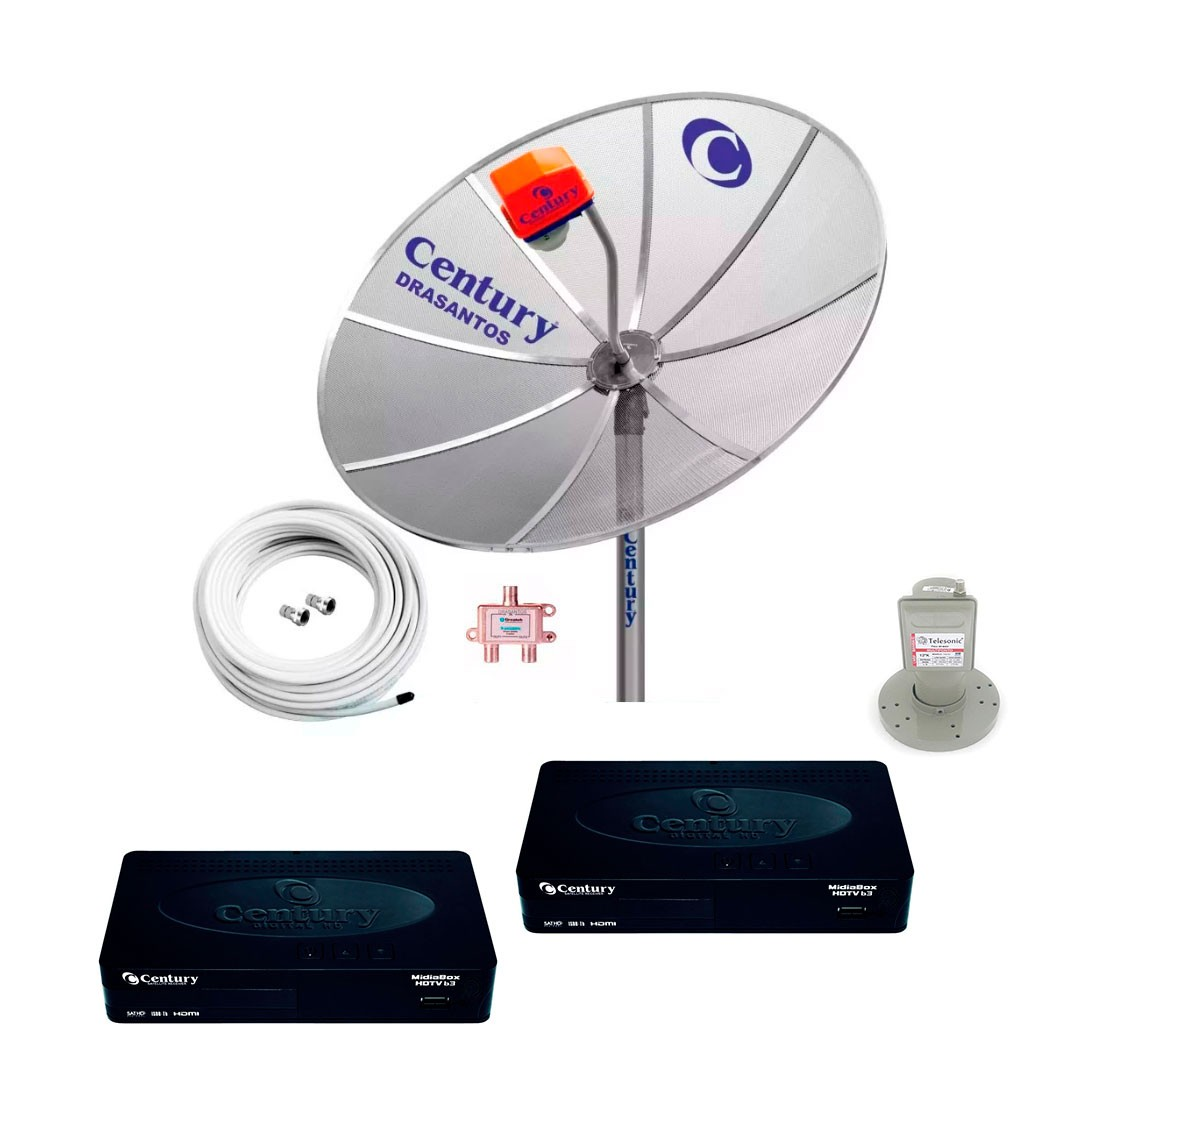 Antena Parabolica Digital Hd Multiponto Completa 2 Midiabox